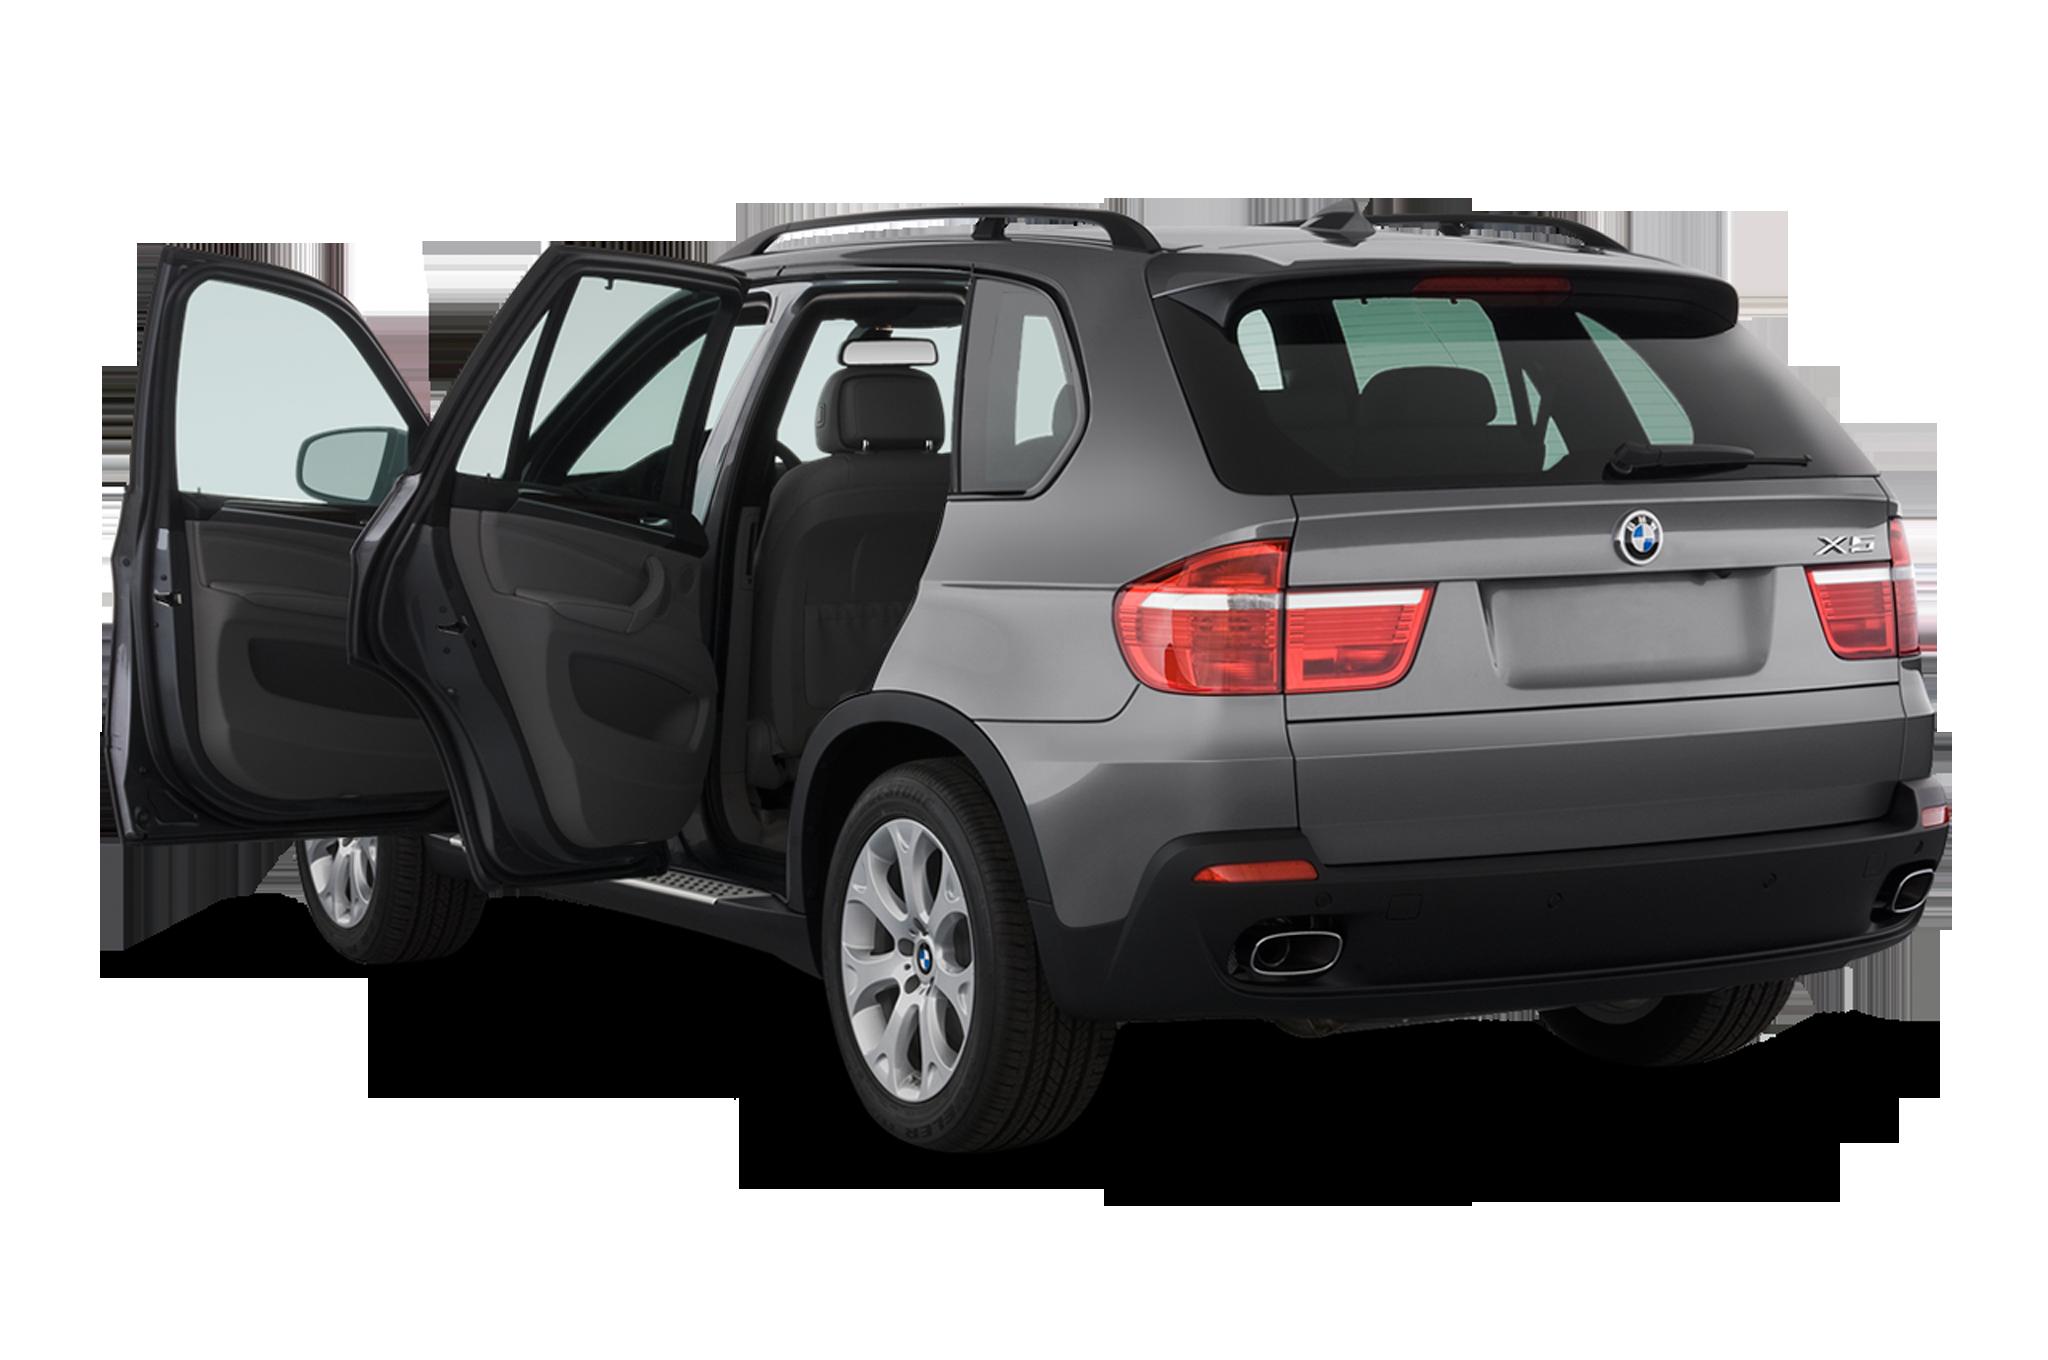 bmw  xdrived bmw luxury crossover suv review automobile magazine